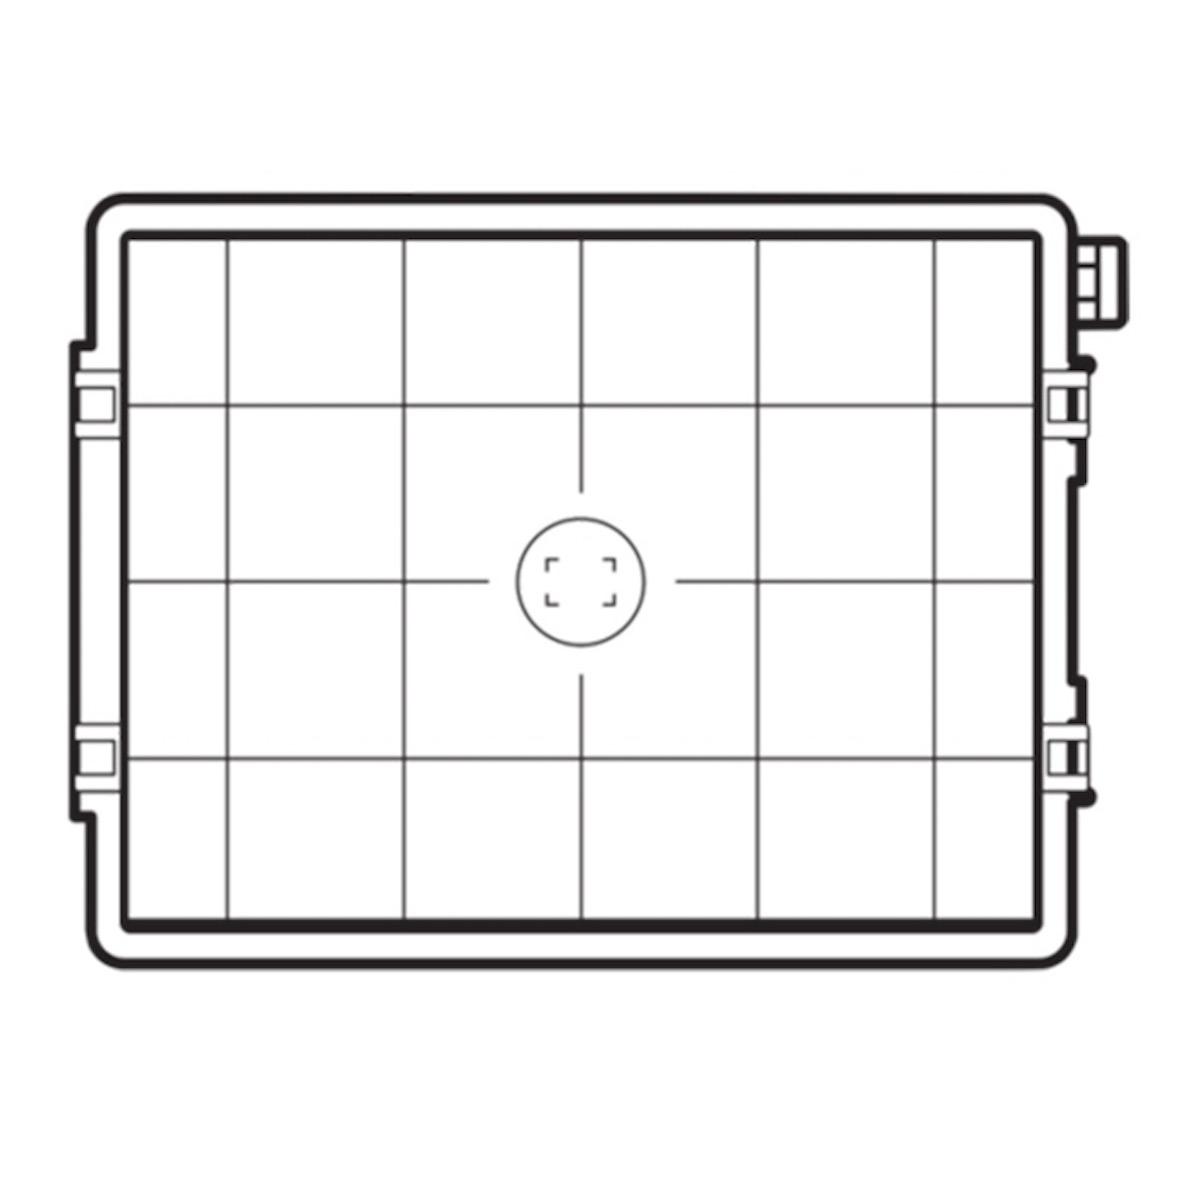 Hasselblad Fokussierscheibe 60MP CCD/100MP Raster